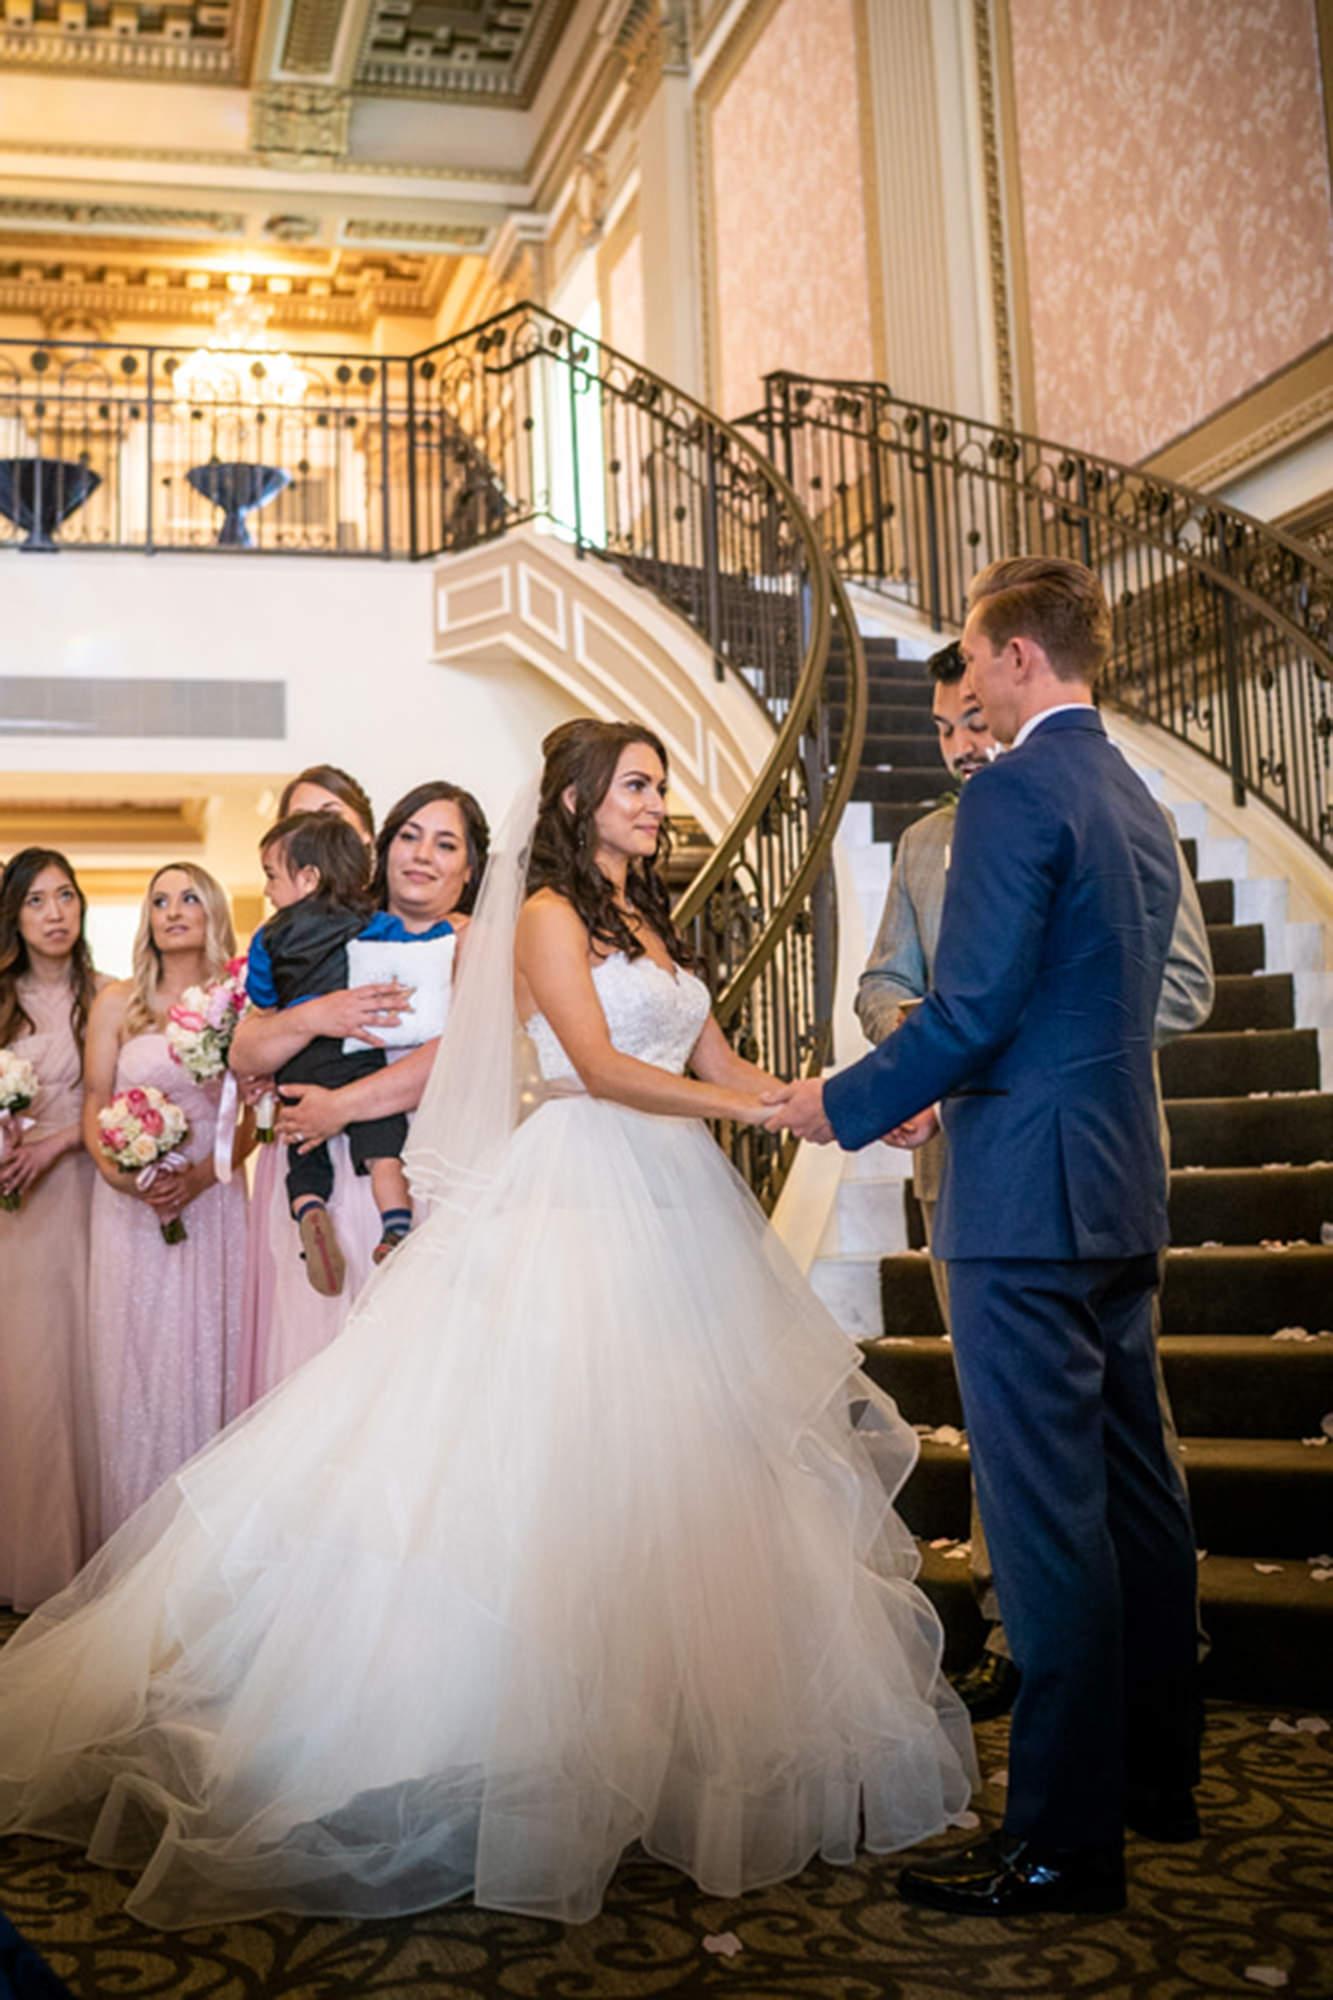 Kate And Brad Wedding Ceremony